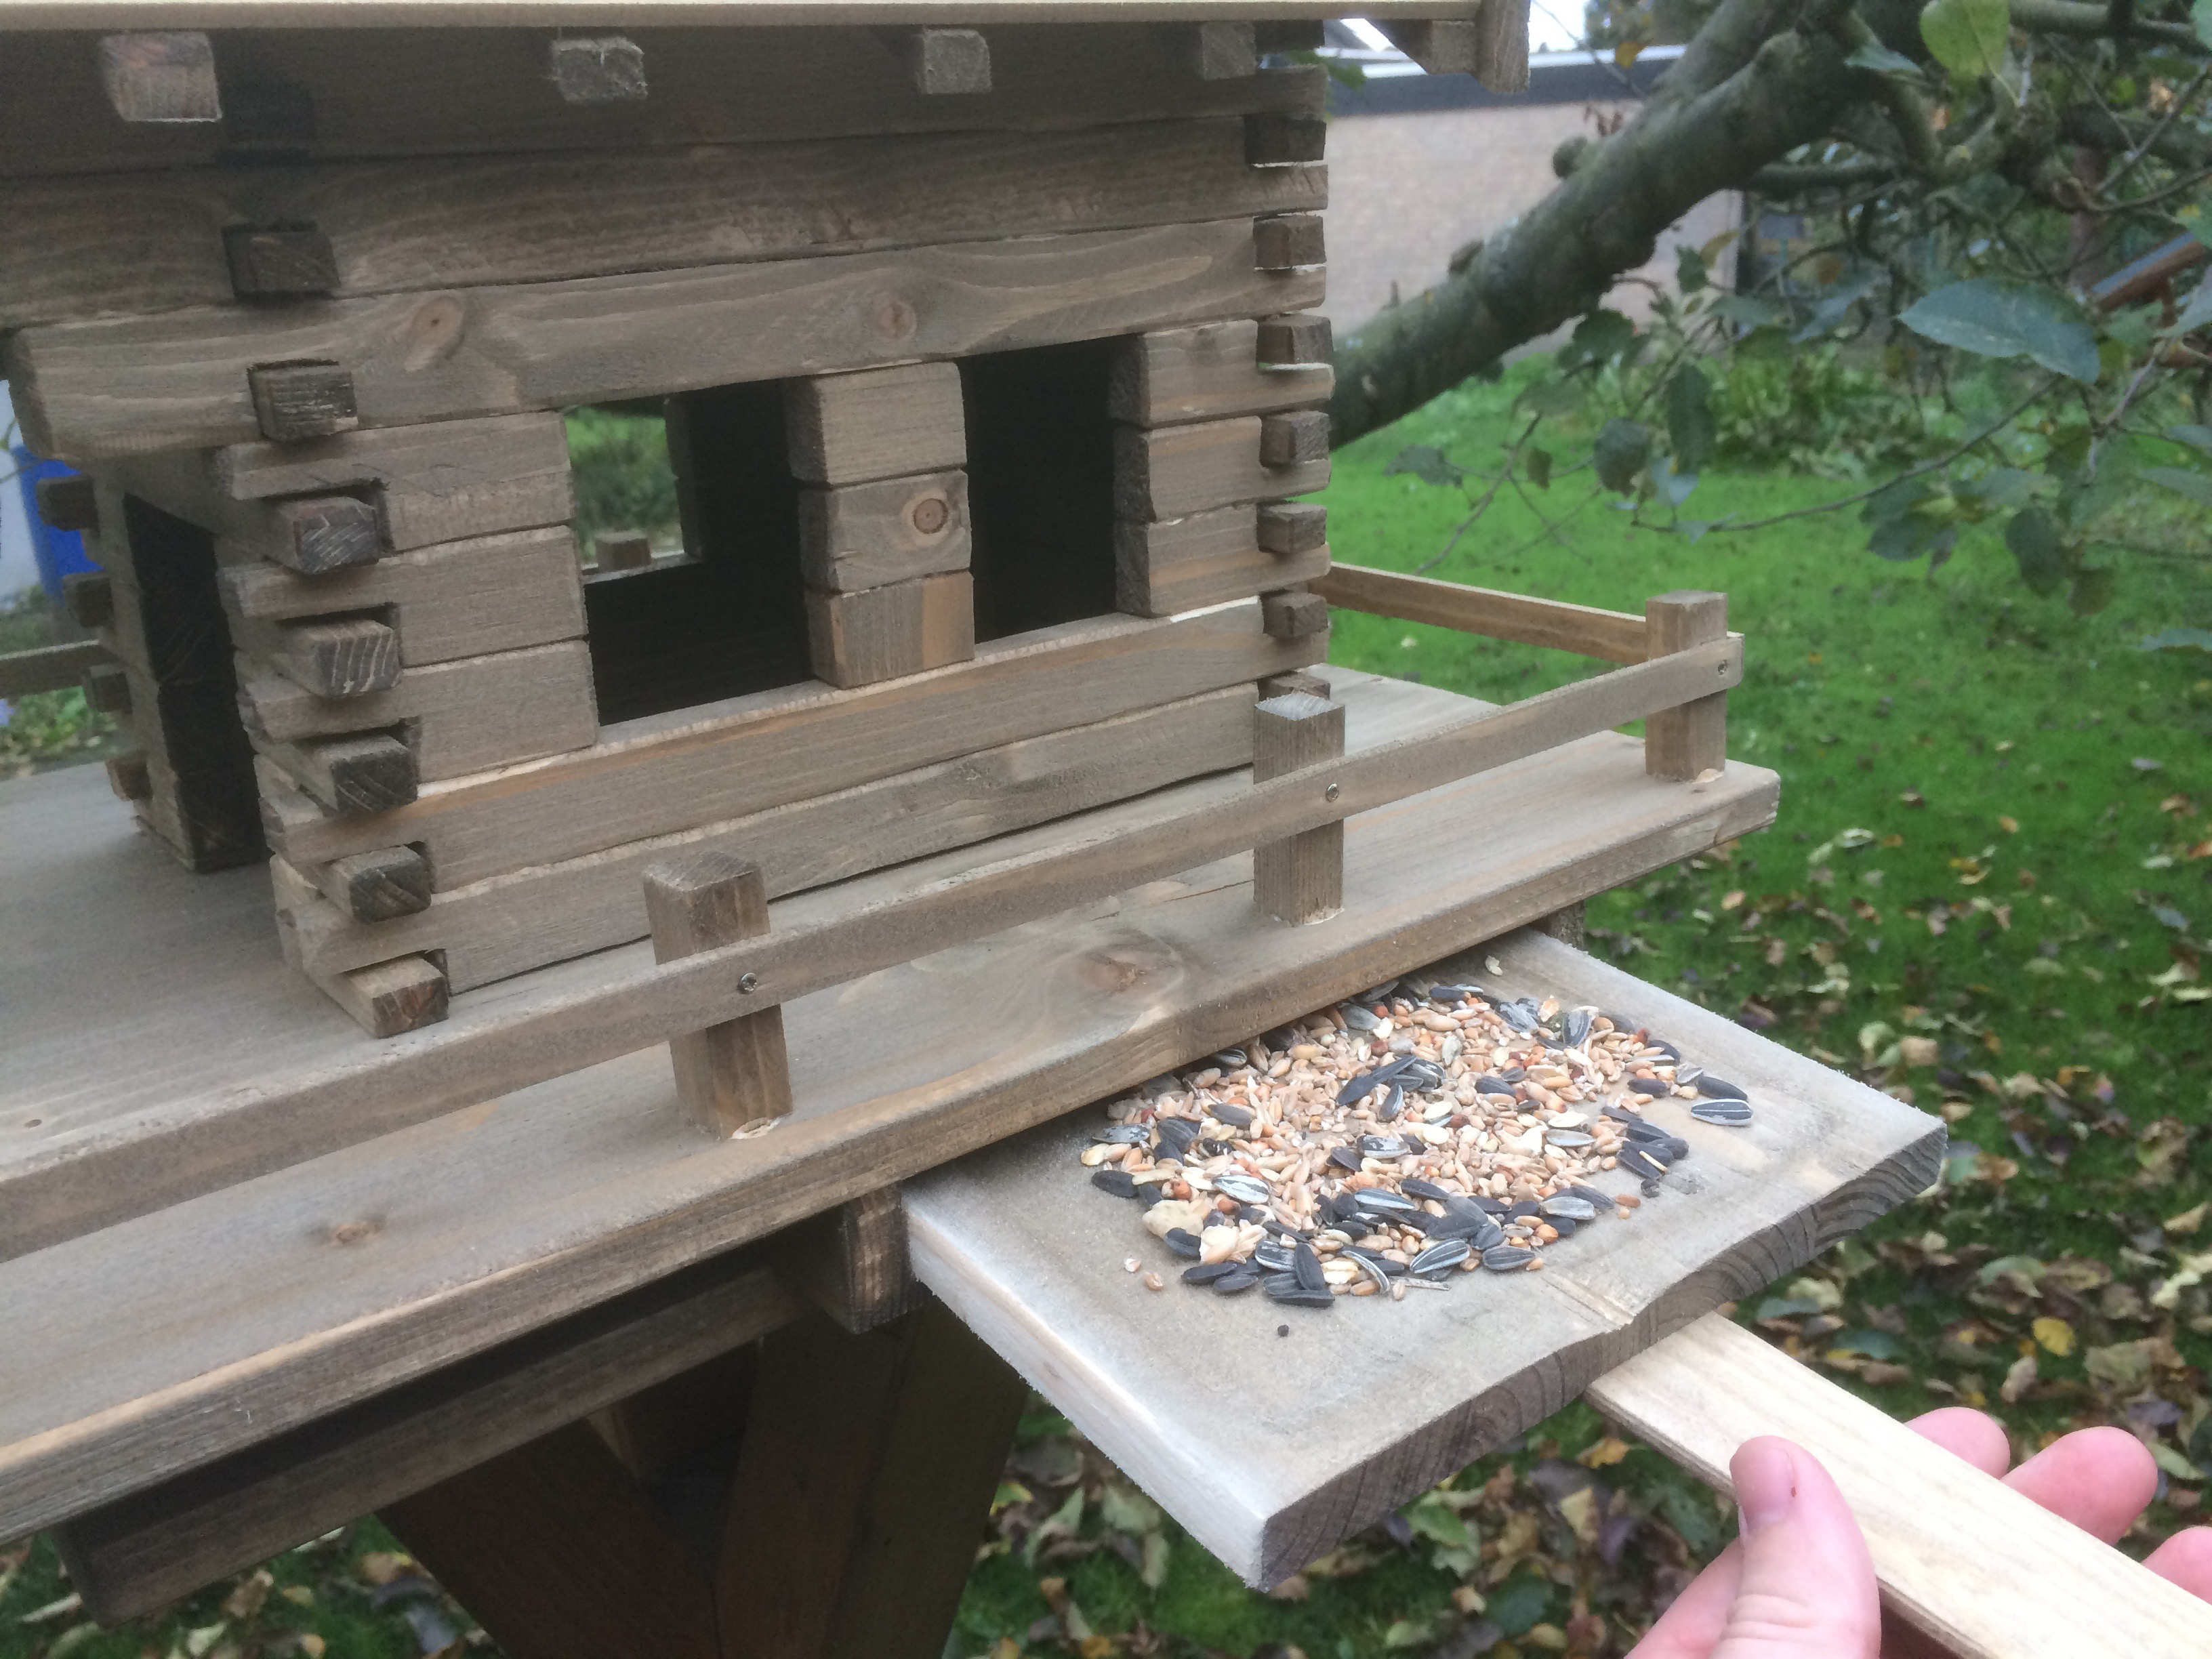 vogelfutterhaus selber bauen anleitung kostenlos swalif. Black Bedroom Furniture Sets. Home Design Ideas